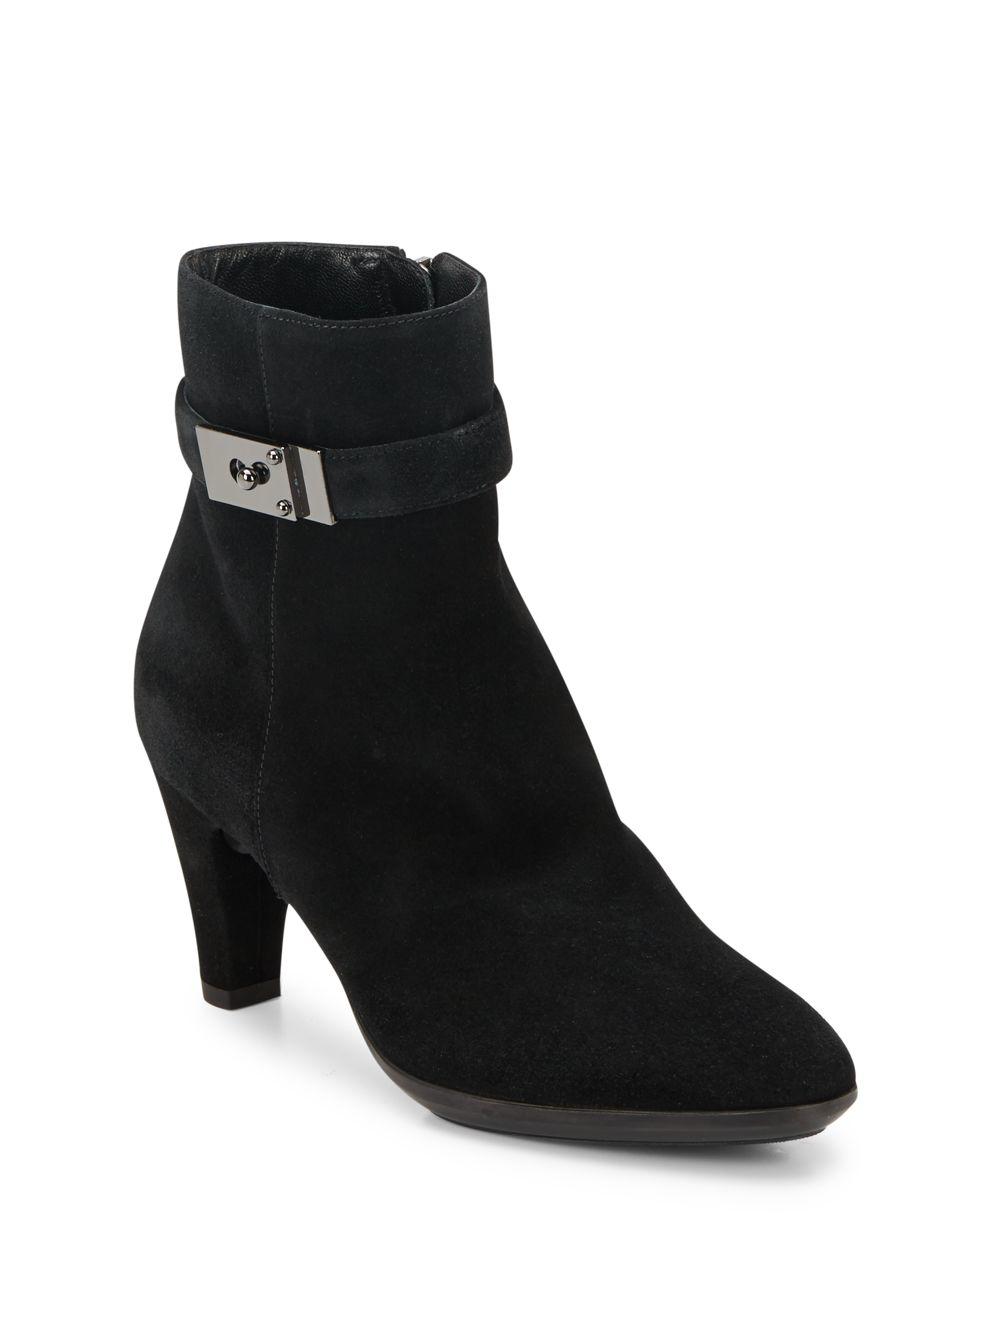 Aquatalia Dana Suede Ankle Boots In Black Lyst